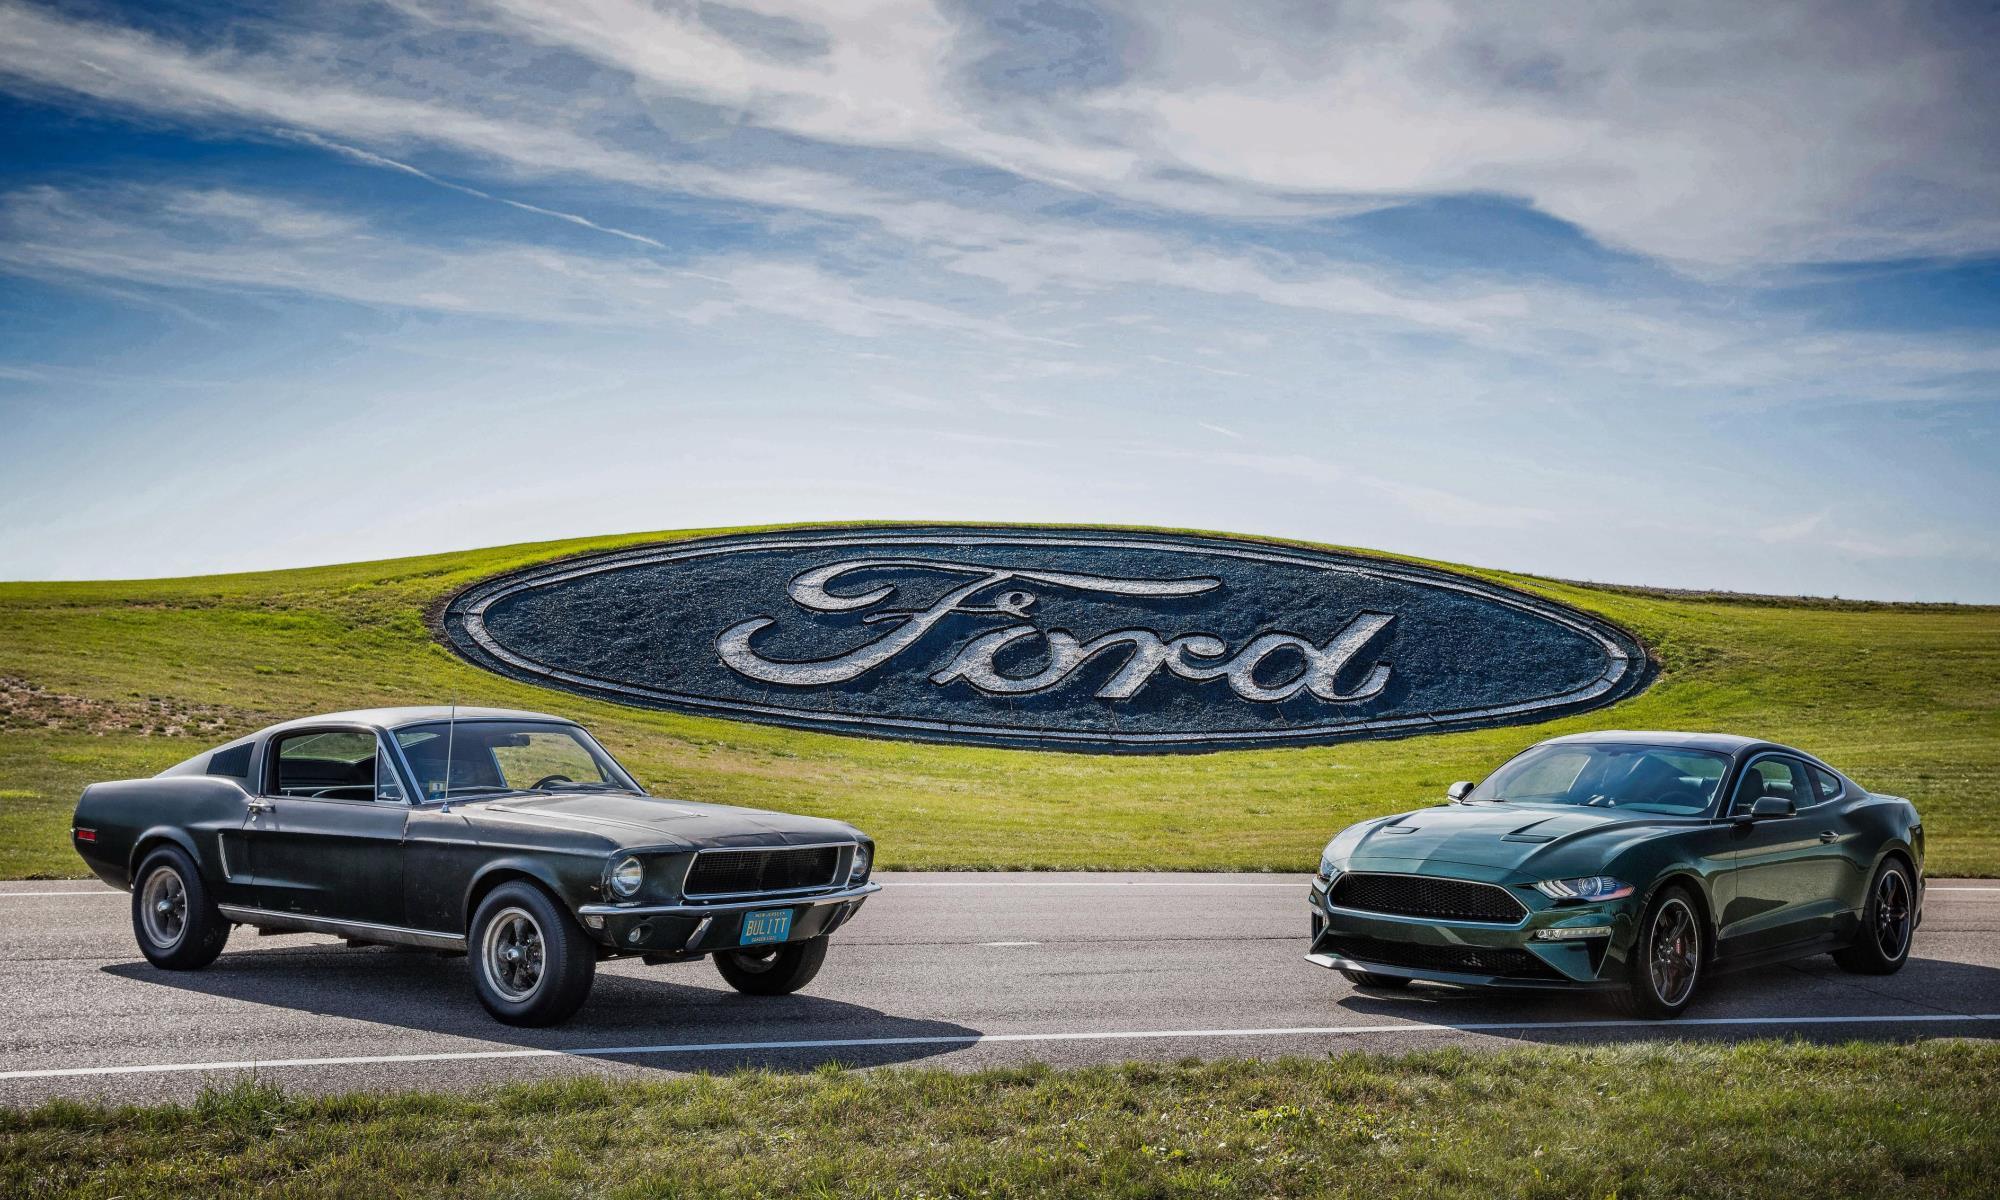 Original Bullitt Mustang movie car with its new namesake